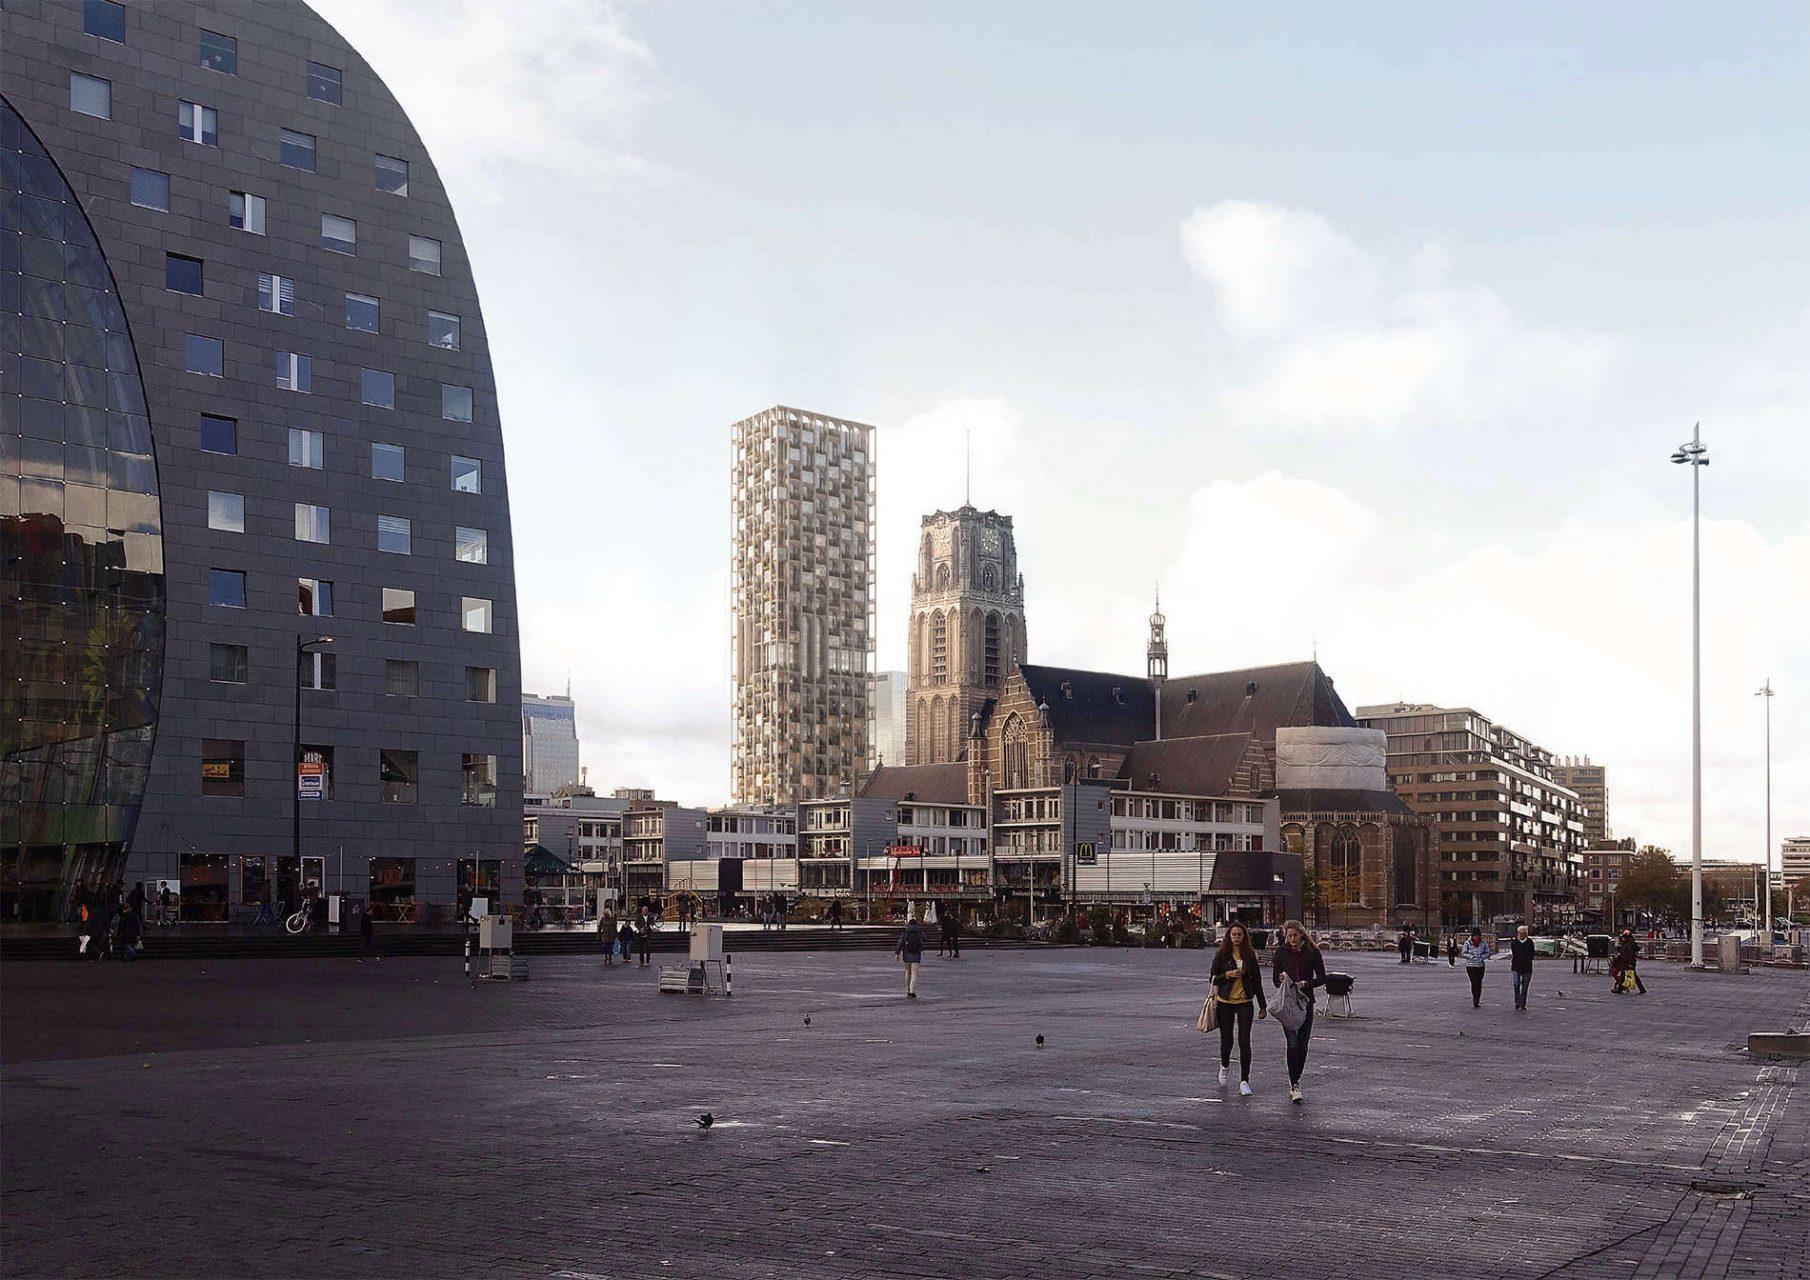 POST. Ein neuer Blickfang in Rotterdams Skyline. Baubeginn 2019.